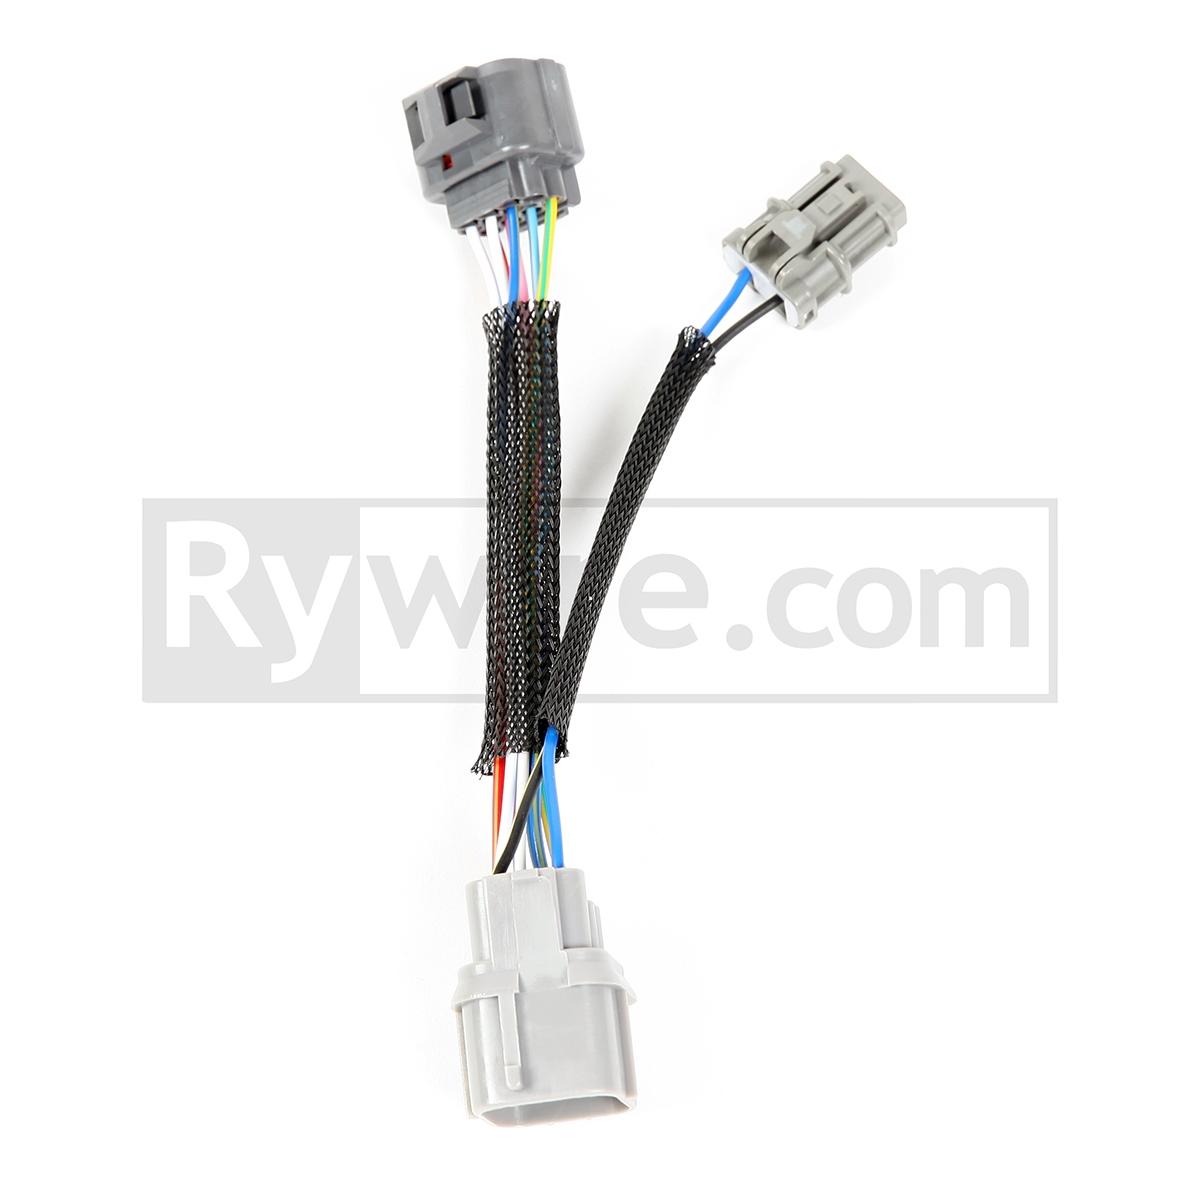 obd2 to obd1 wiring diagram rywire obd2 10 pin to obd1 distributor adapter  obd2 10 pin to obd1 distributor adapter